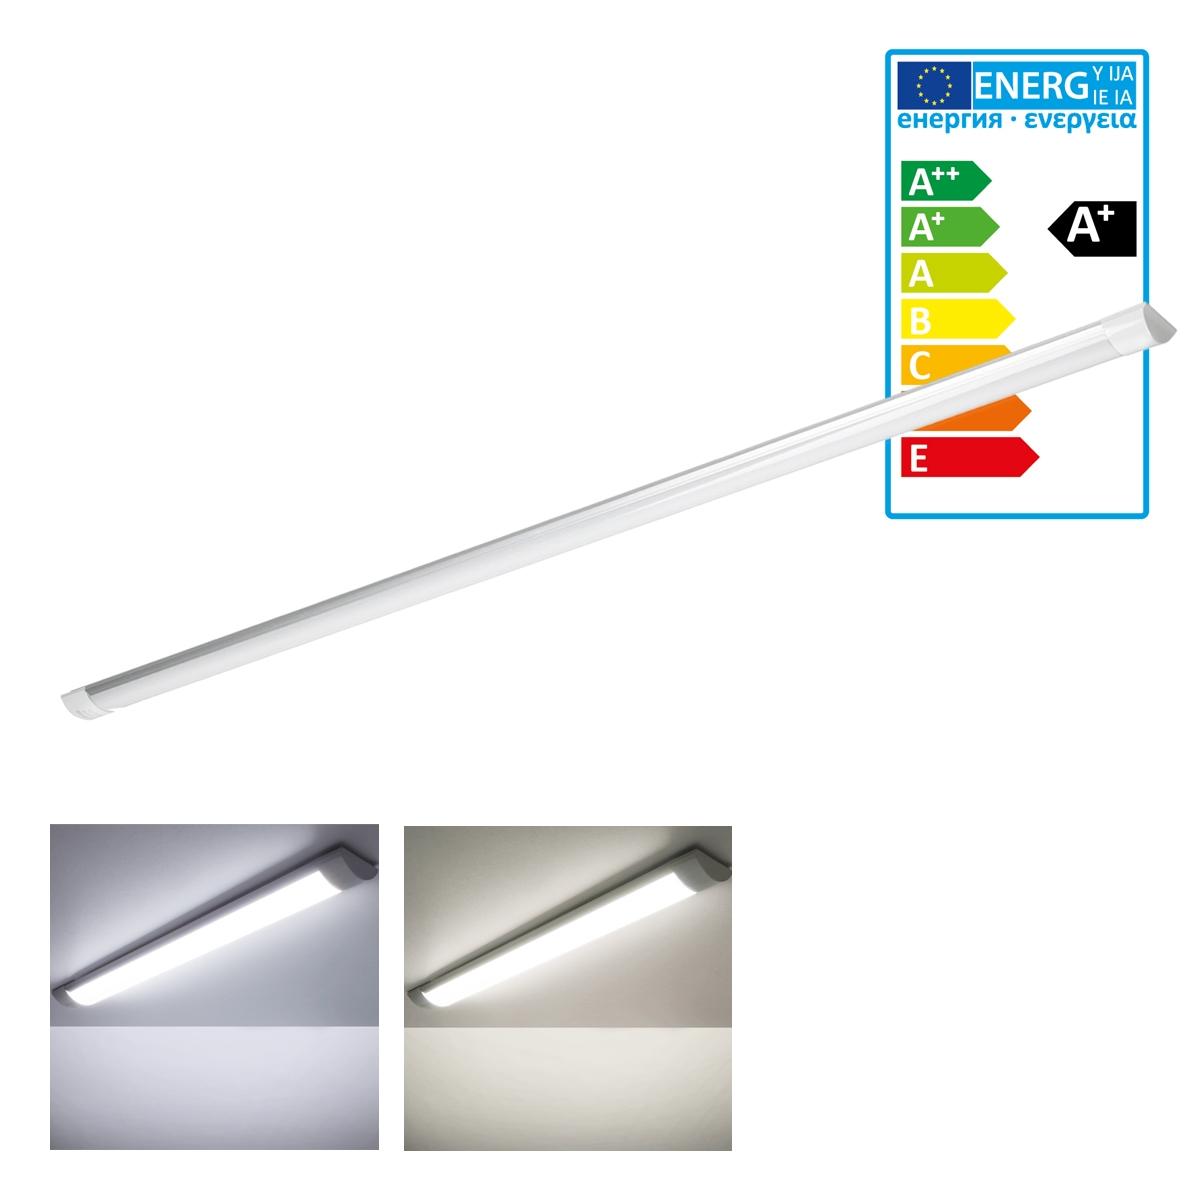 Kalt 36W LED Deckenleuchte SLIM Panel Lampe Bürolampe Büroleuchte Deckenlampe